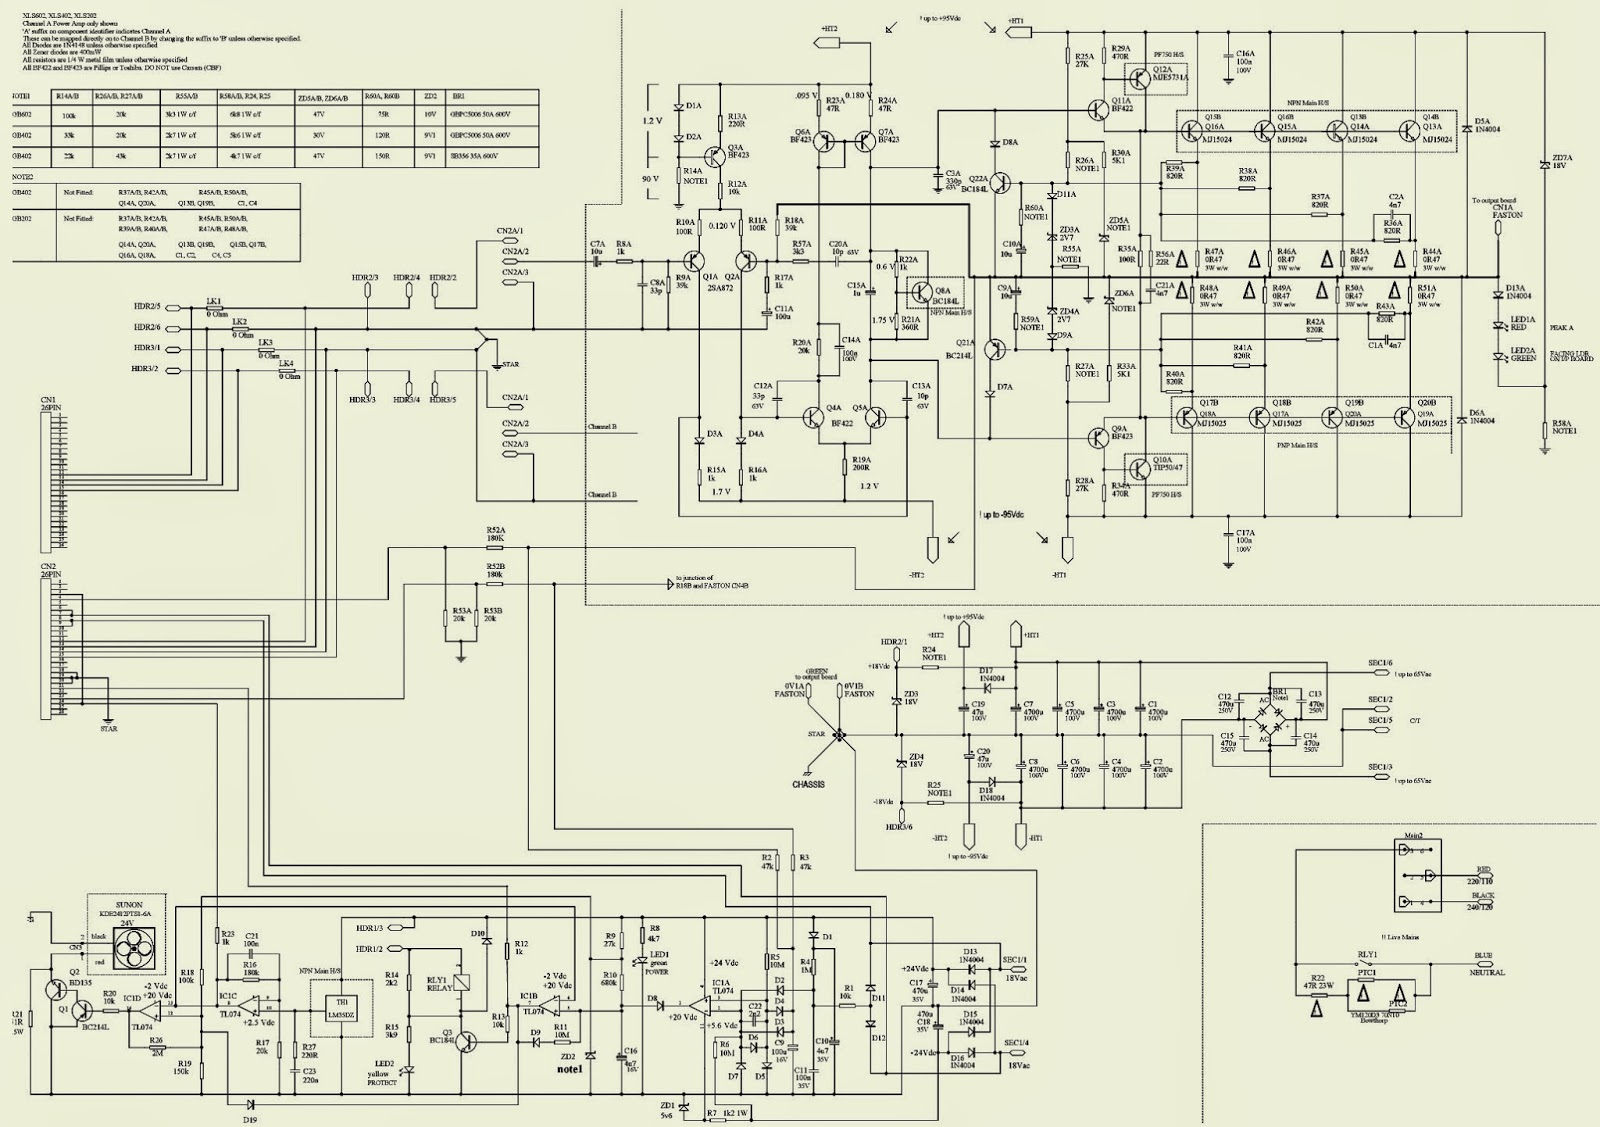 medium resolution of crown xls602 xls402 xls202 amp schematic circuit diagram